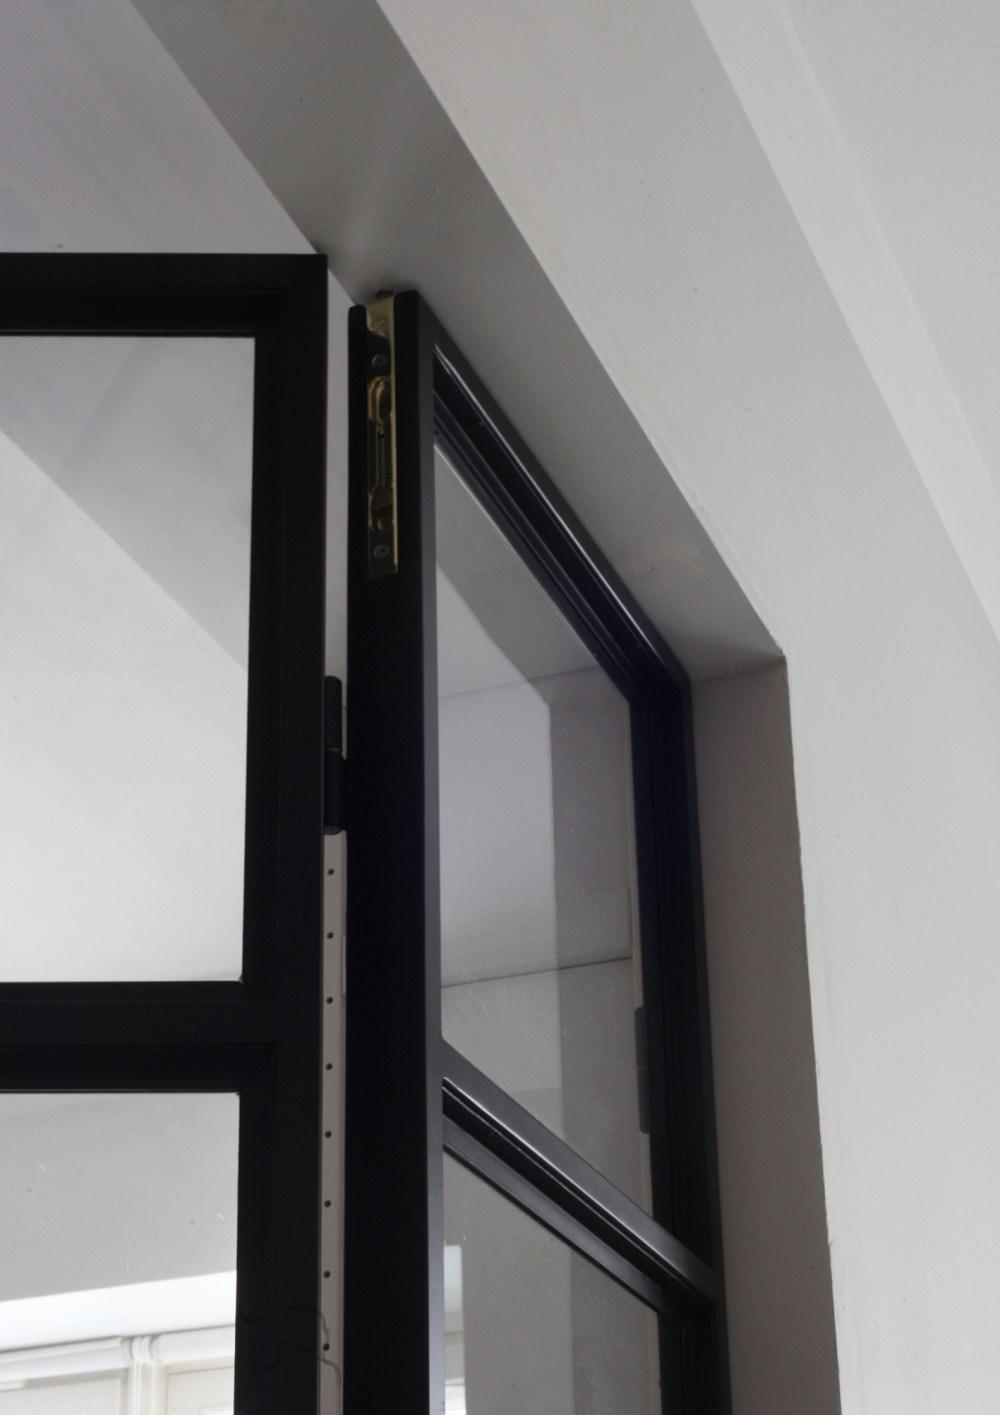 glassdoors_susannavento2_low